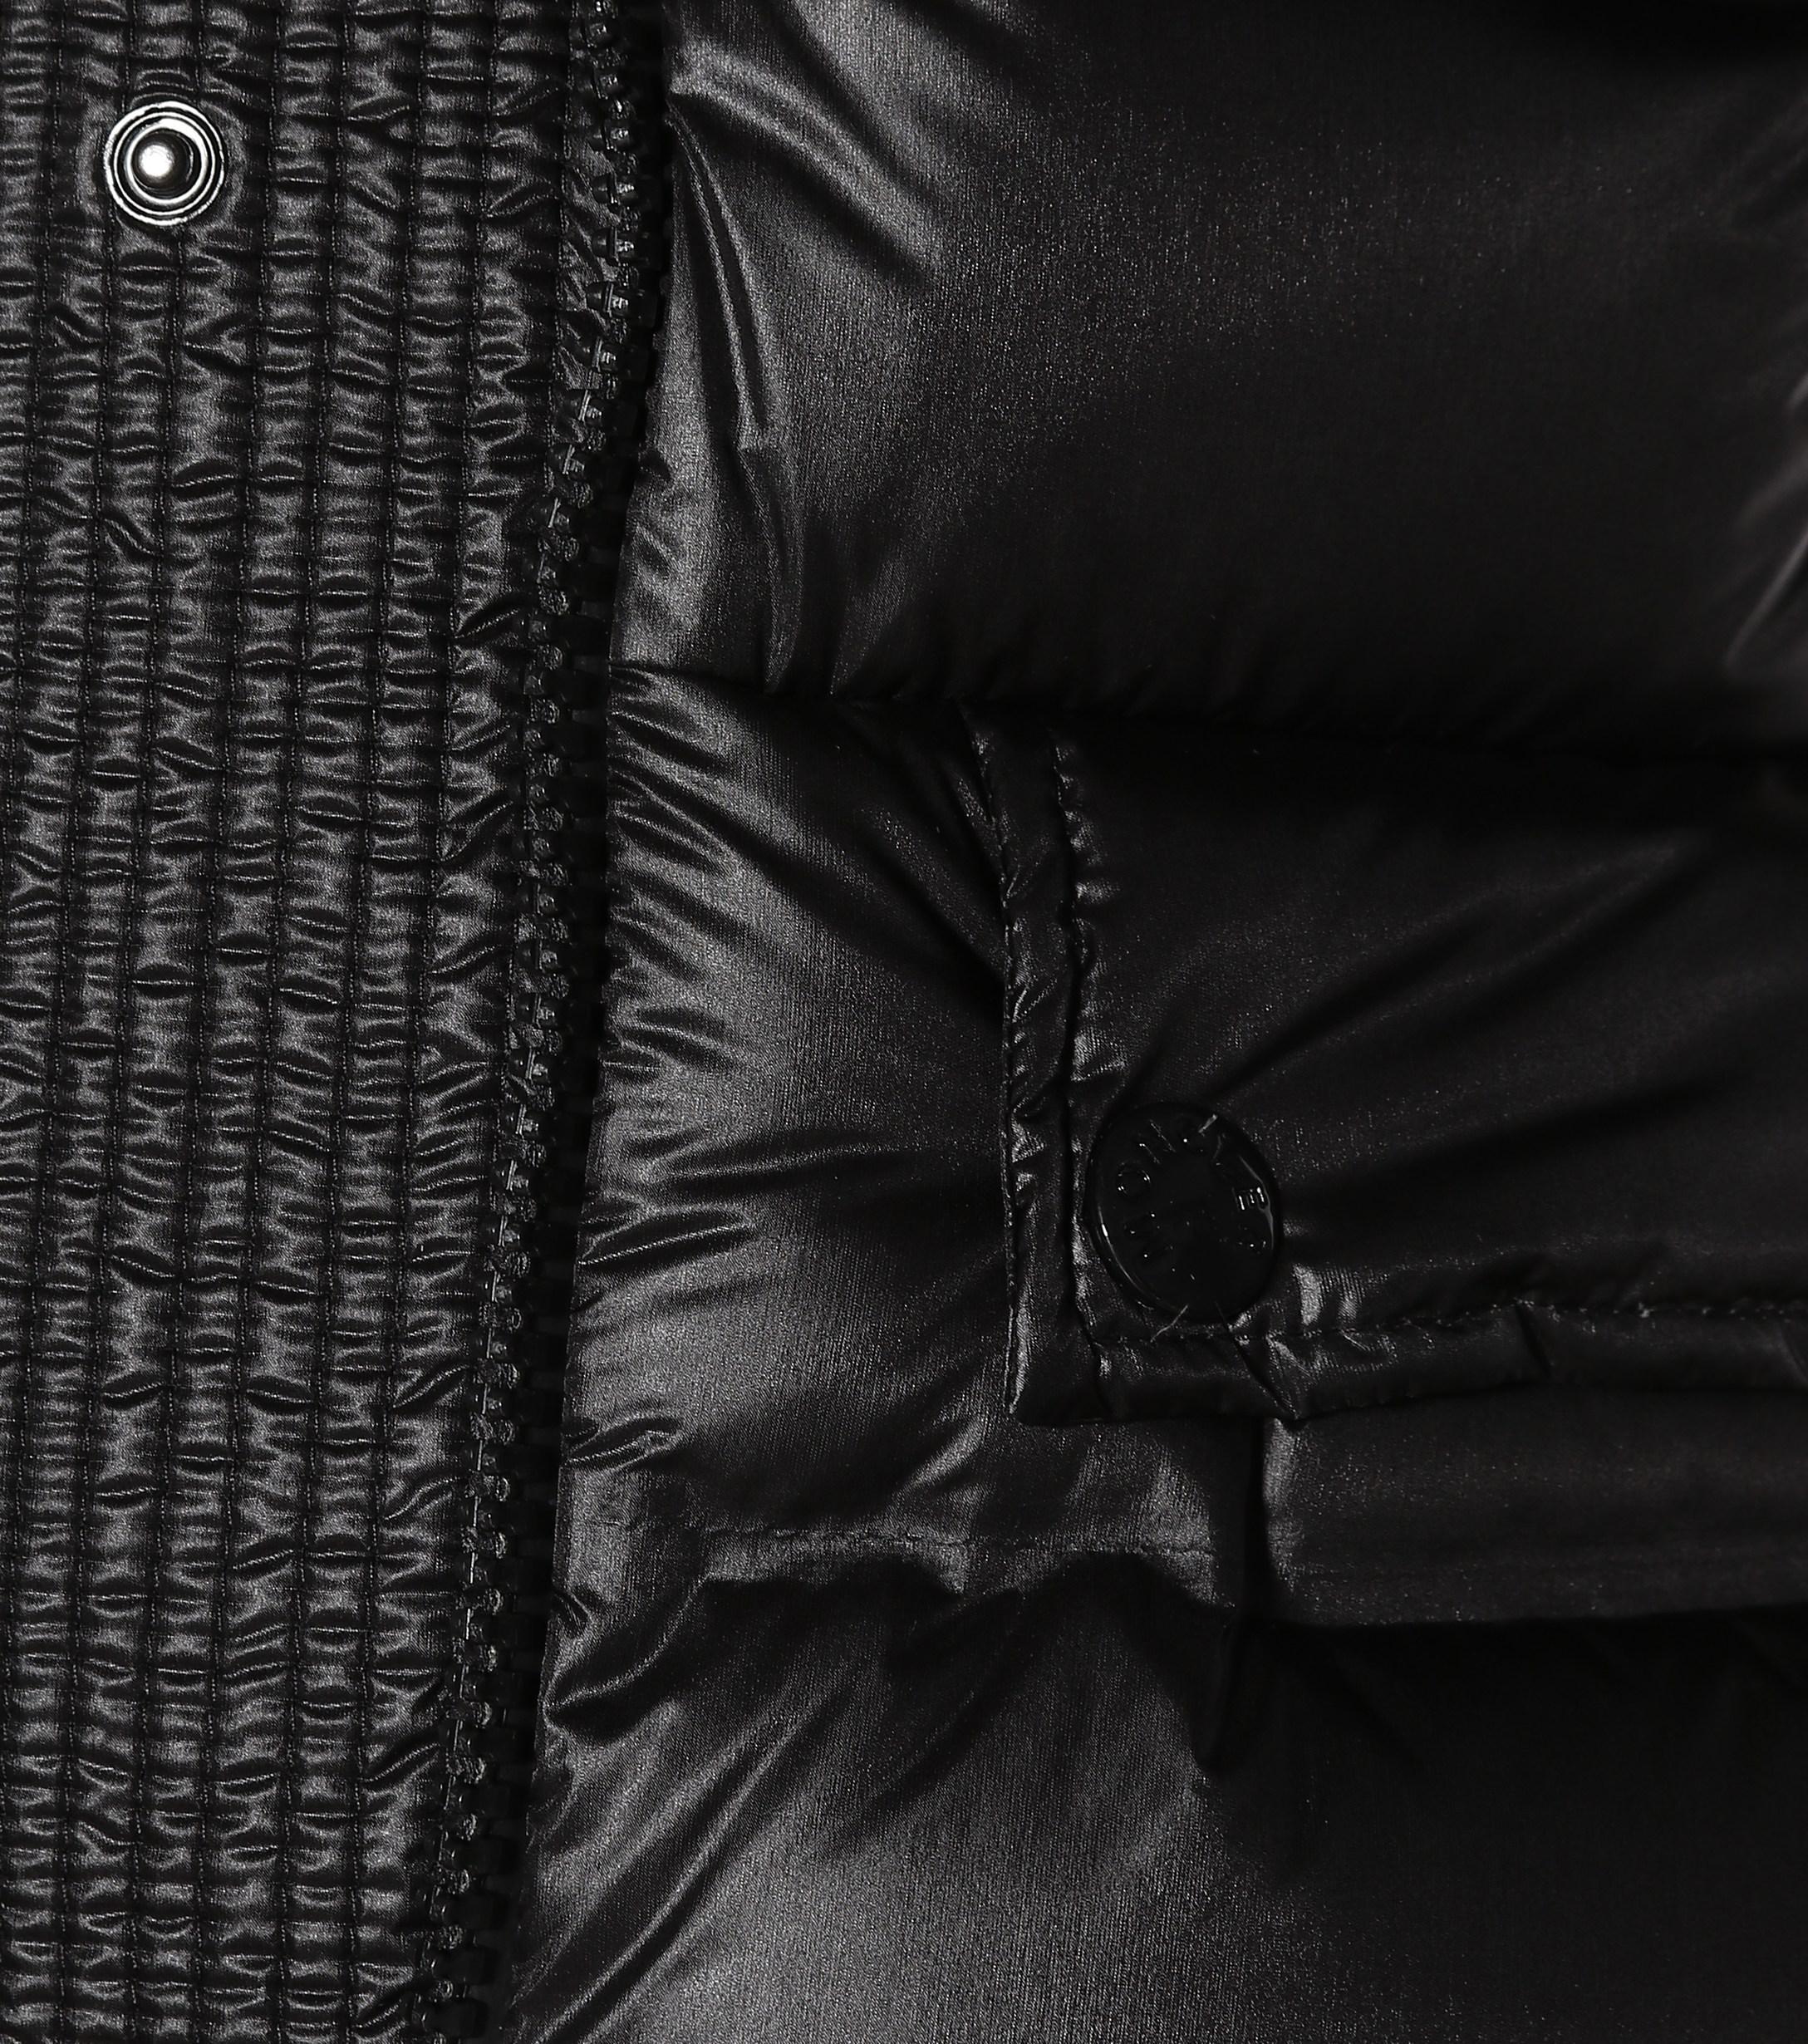 Chaqueta acolchada 3 MONCLER GRENOBLE de Tejido sintético de color Negro